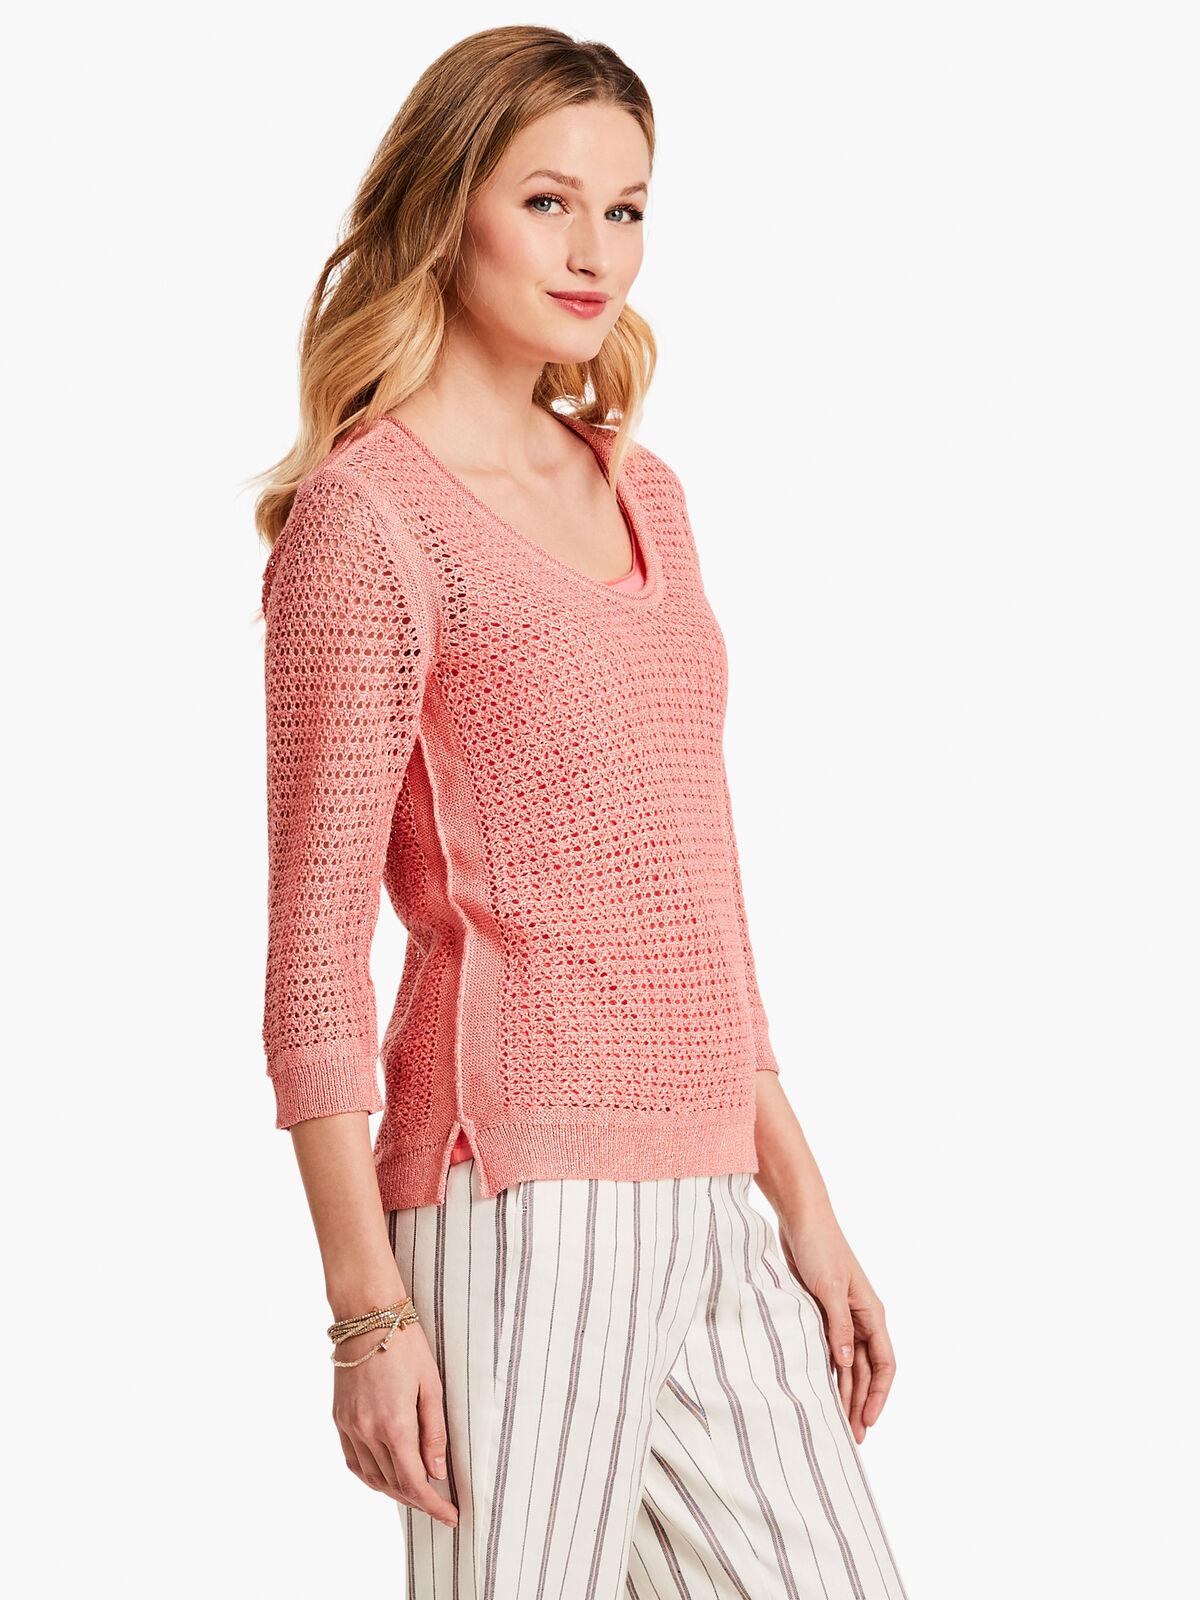 Tangelo Sweater